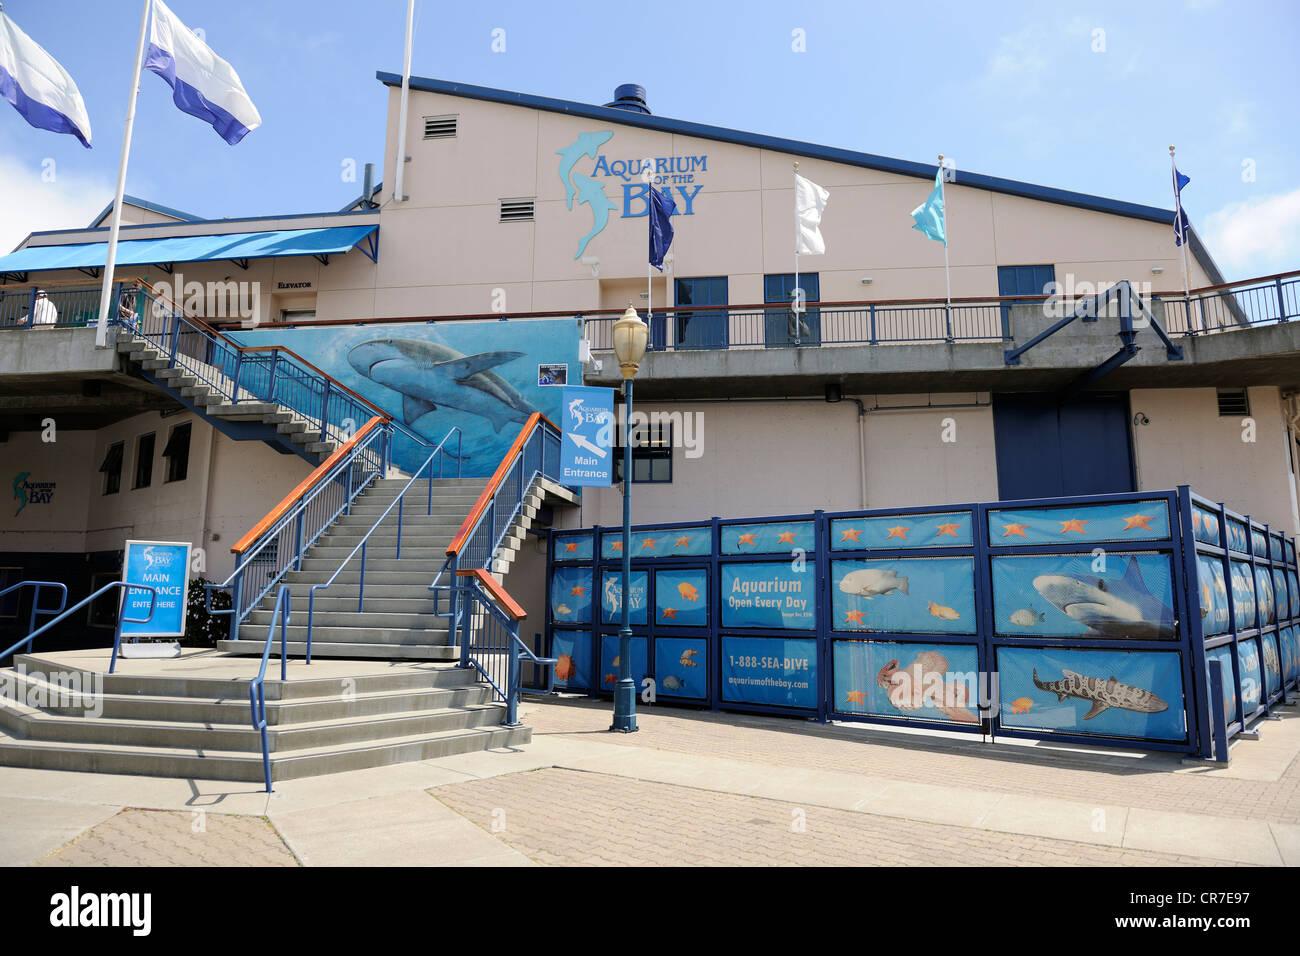 Aquarium By The Bay At Pier 39 Fisherman 39 S Wharf San